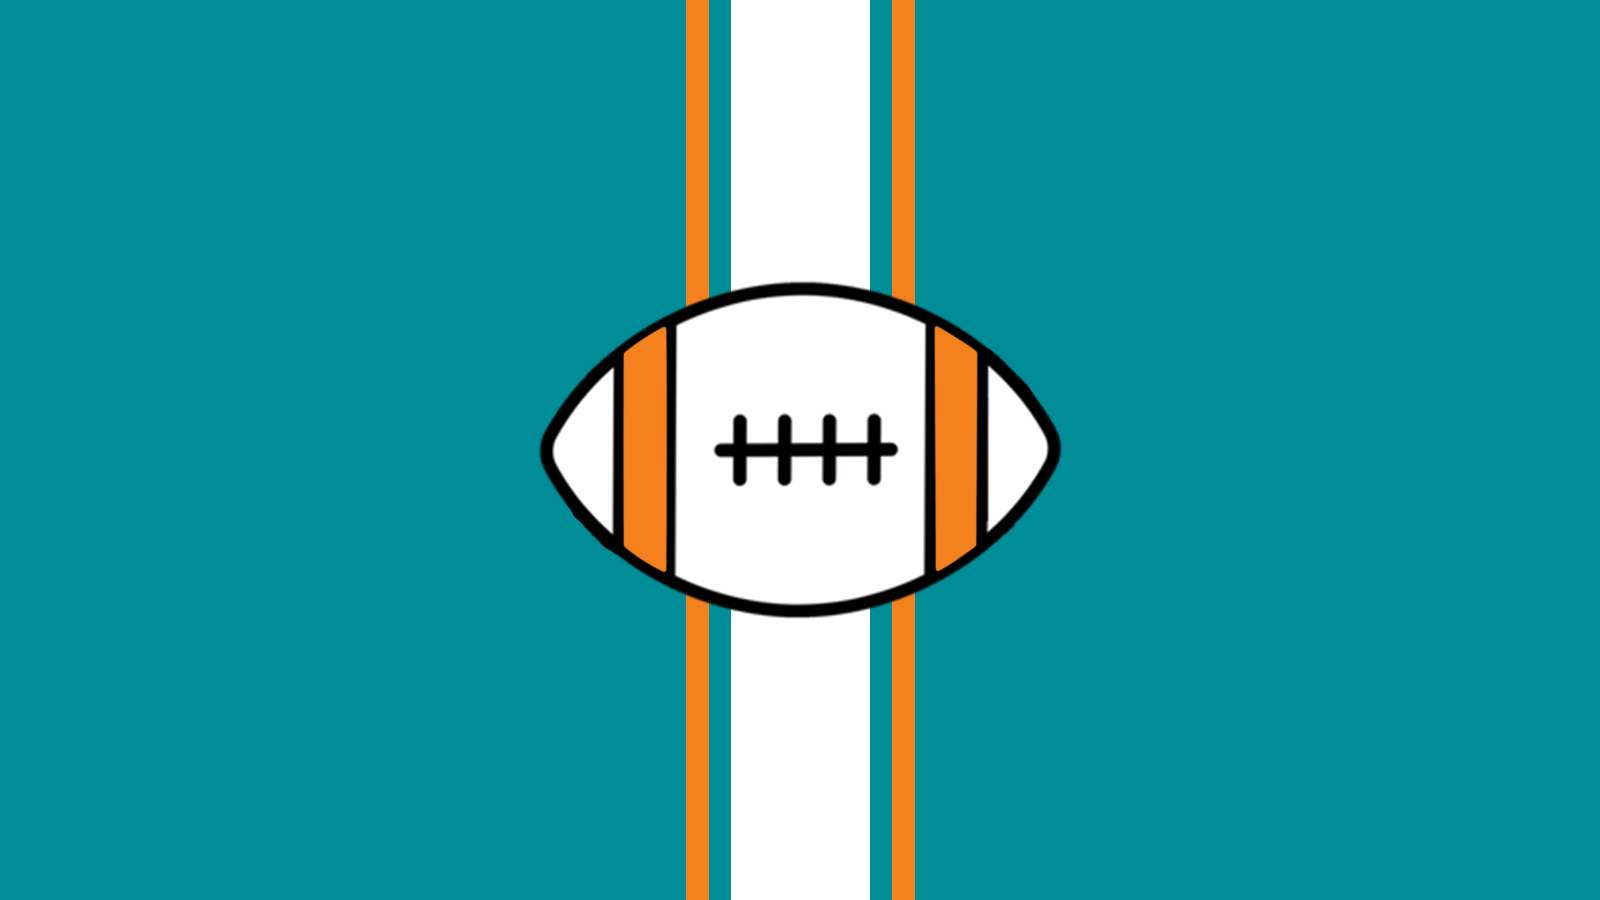 New England Patriots at Miami Dolphins (Reduced Capacity, Social Distancing)